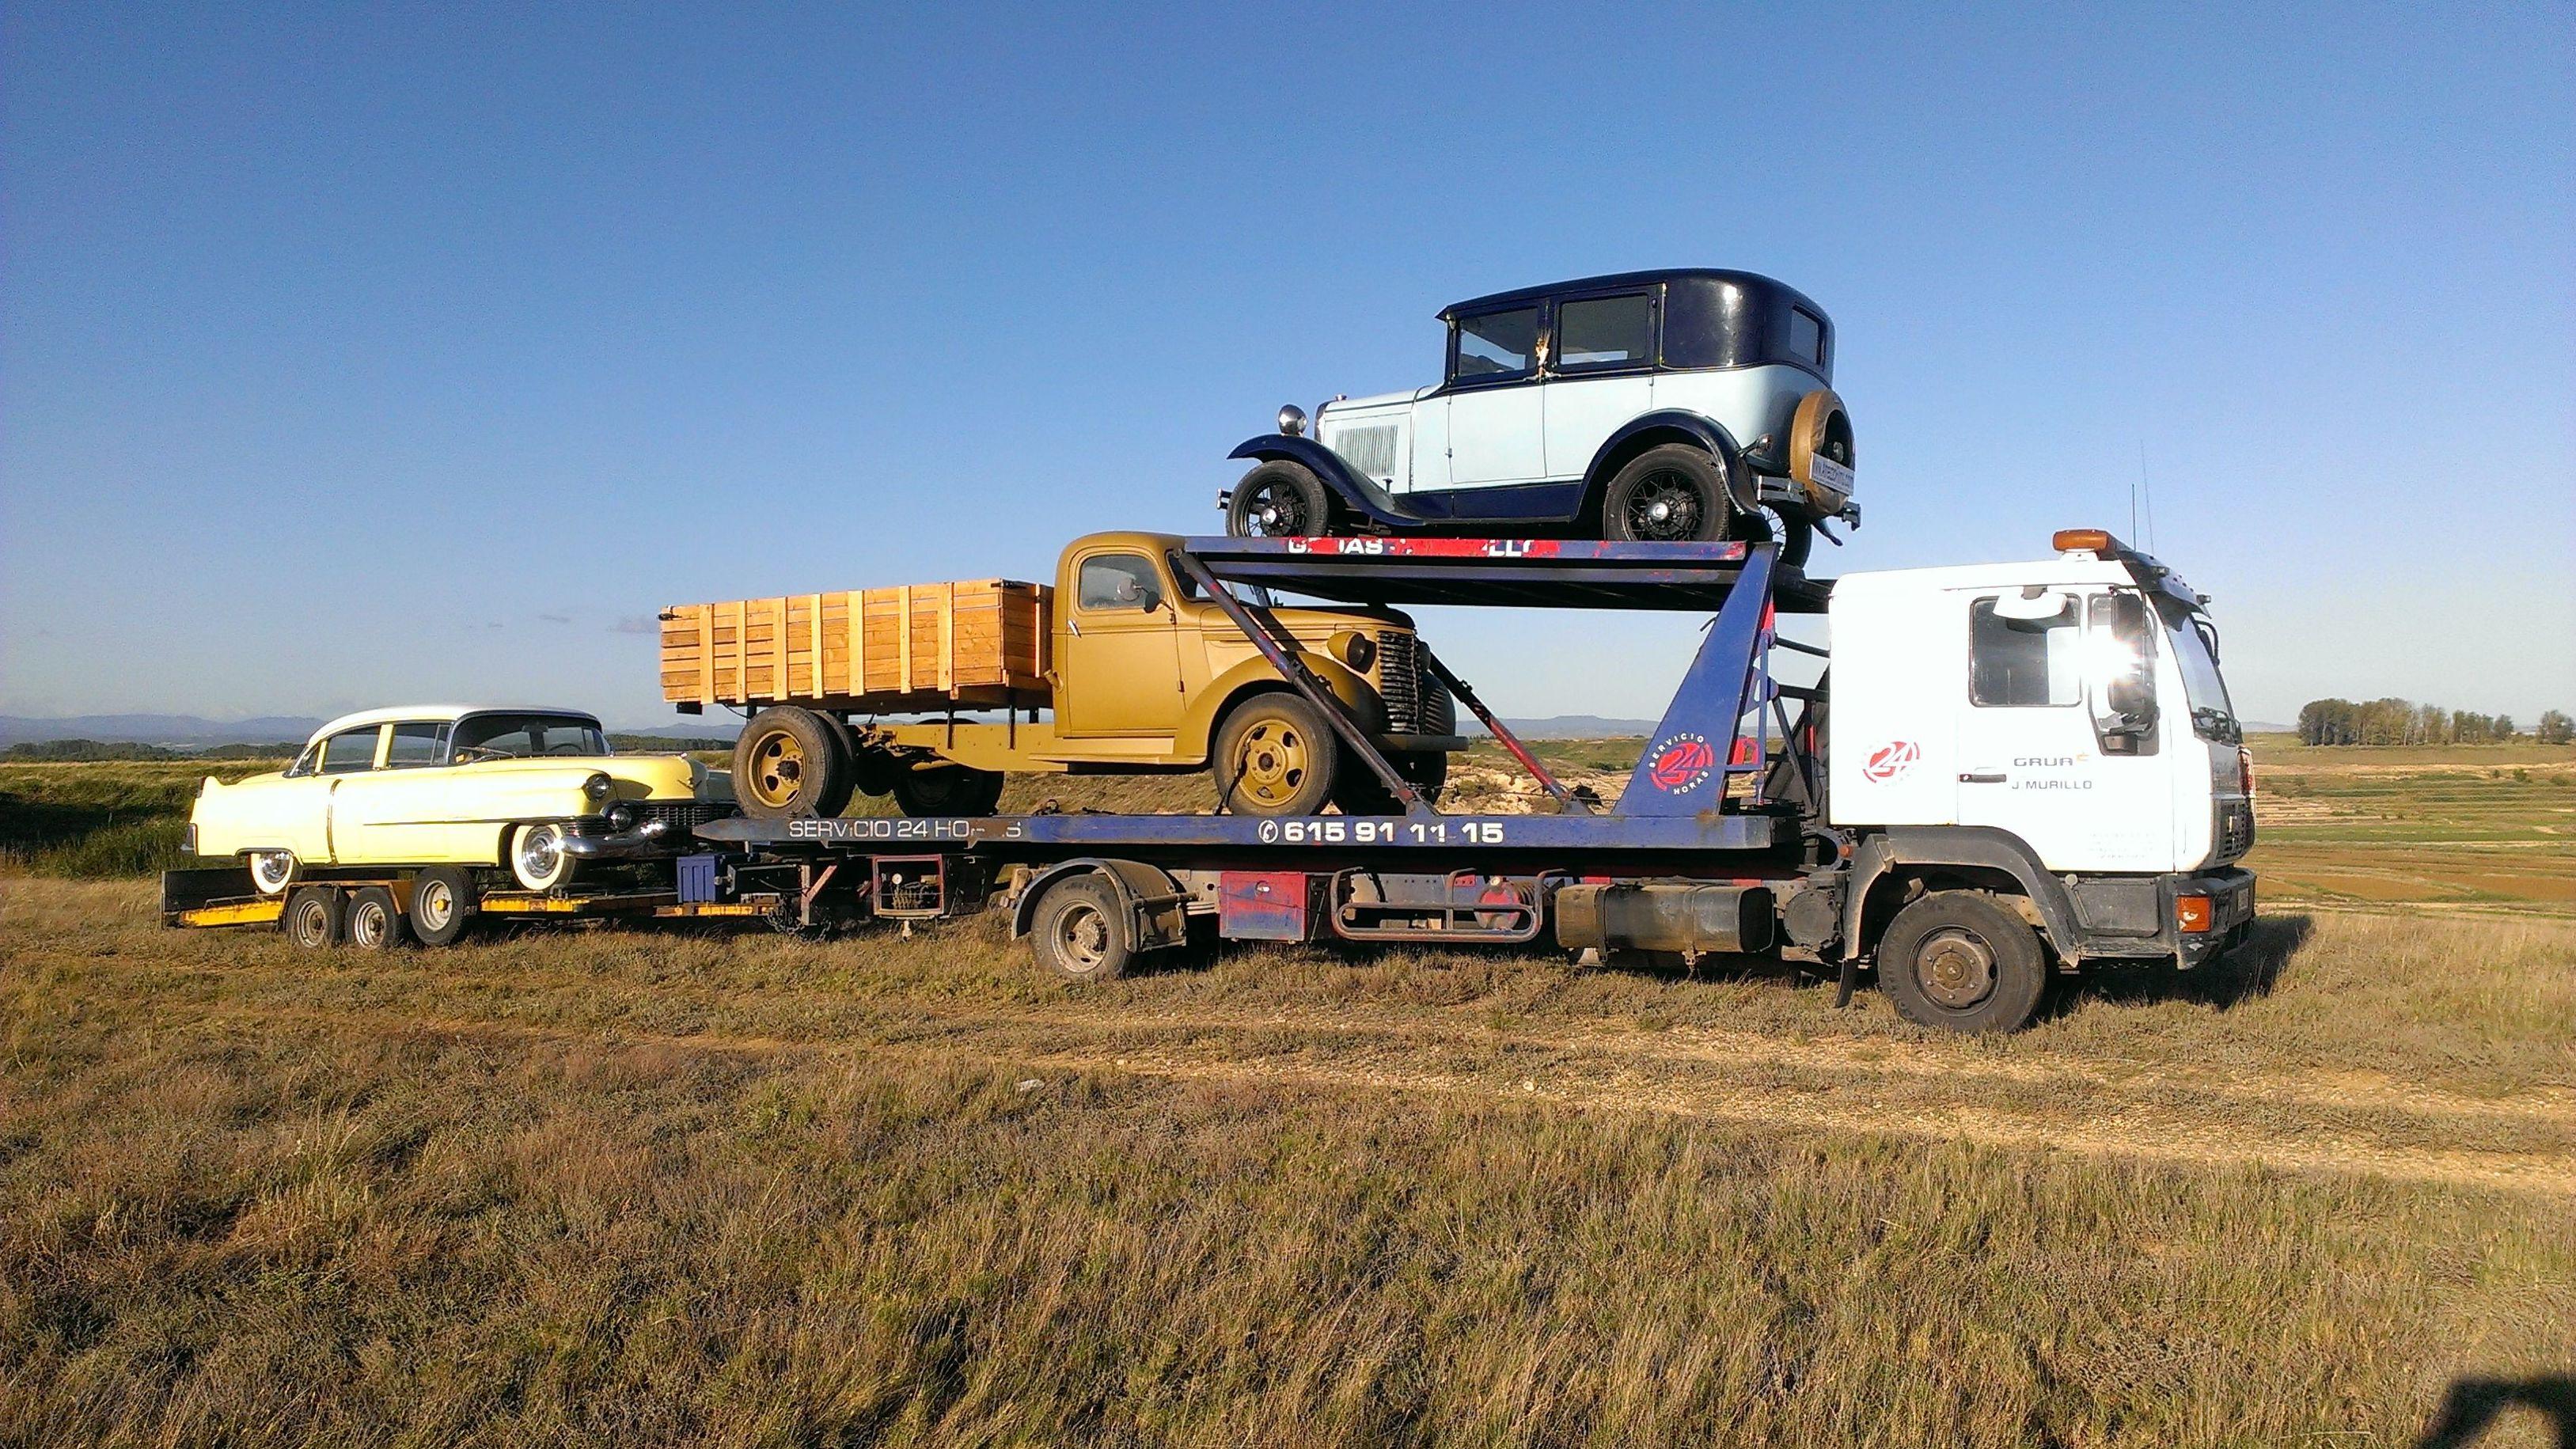 Foto 21 de Grúas para vehículos en Pedrola | Grúas J. Murillo